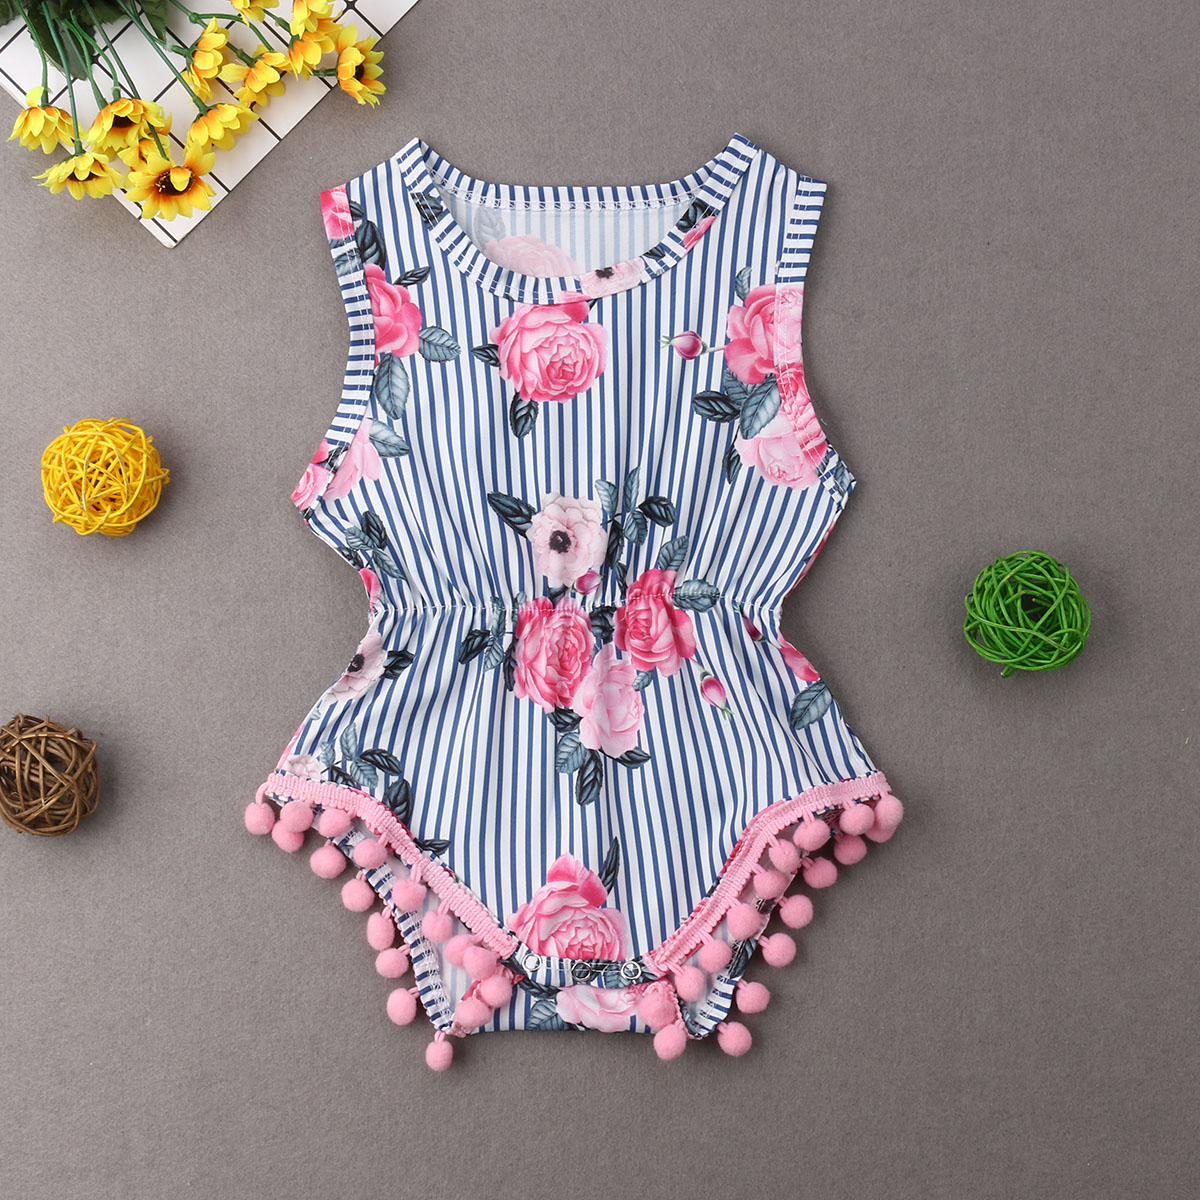 Pudcoco Girl Jumpsuits 0-18M US Newborn Kid Baby Girls Floral   Romper   Jumpsuit Outfit Sunsuit Clothes